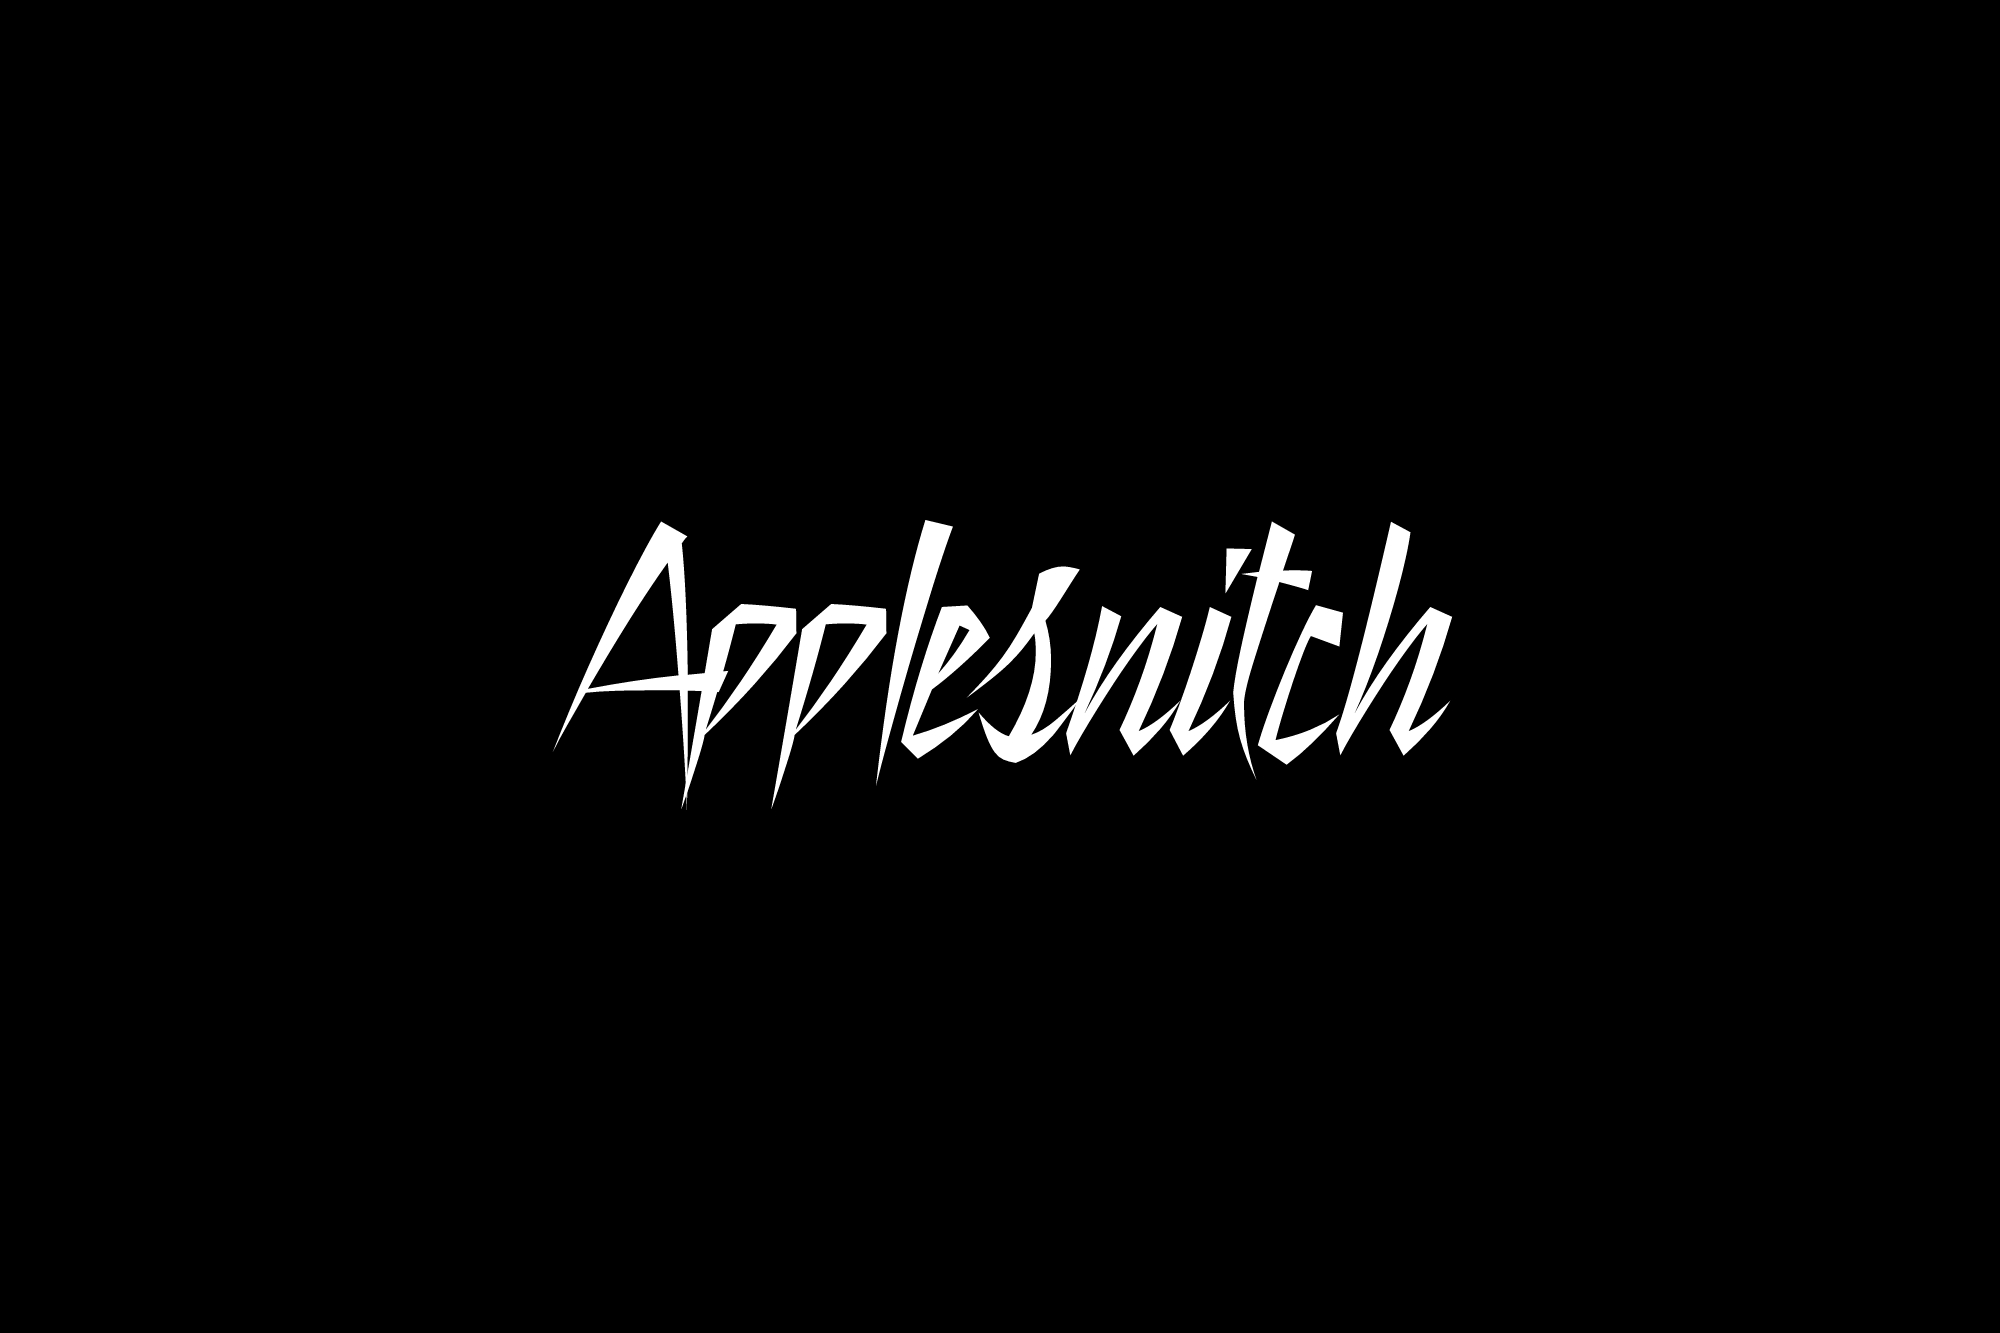 Applesnitch logo